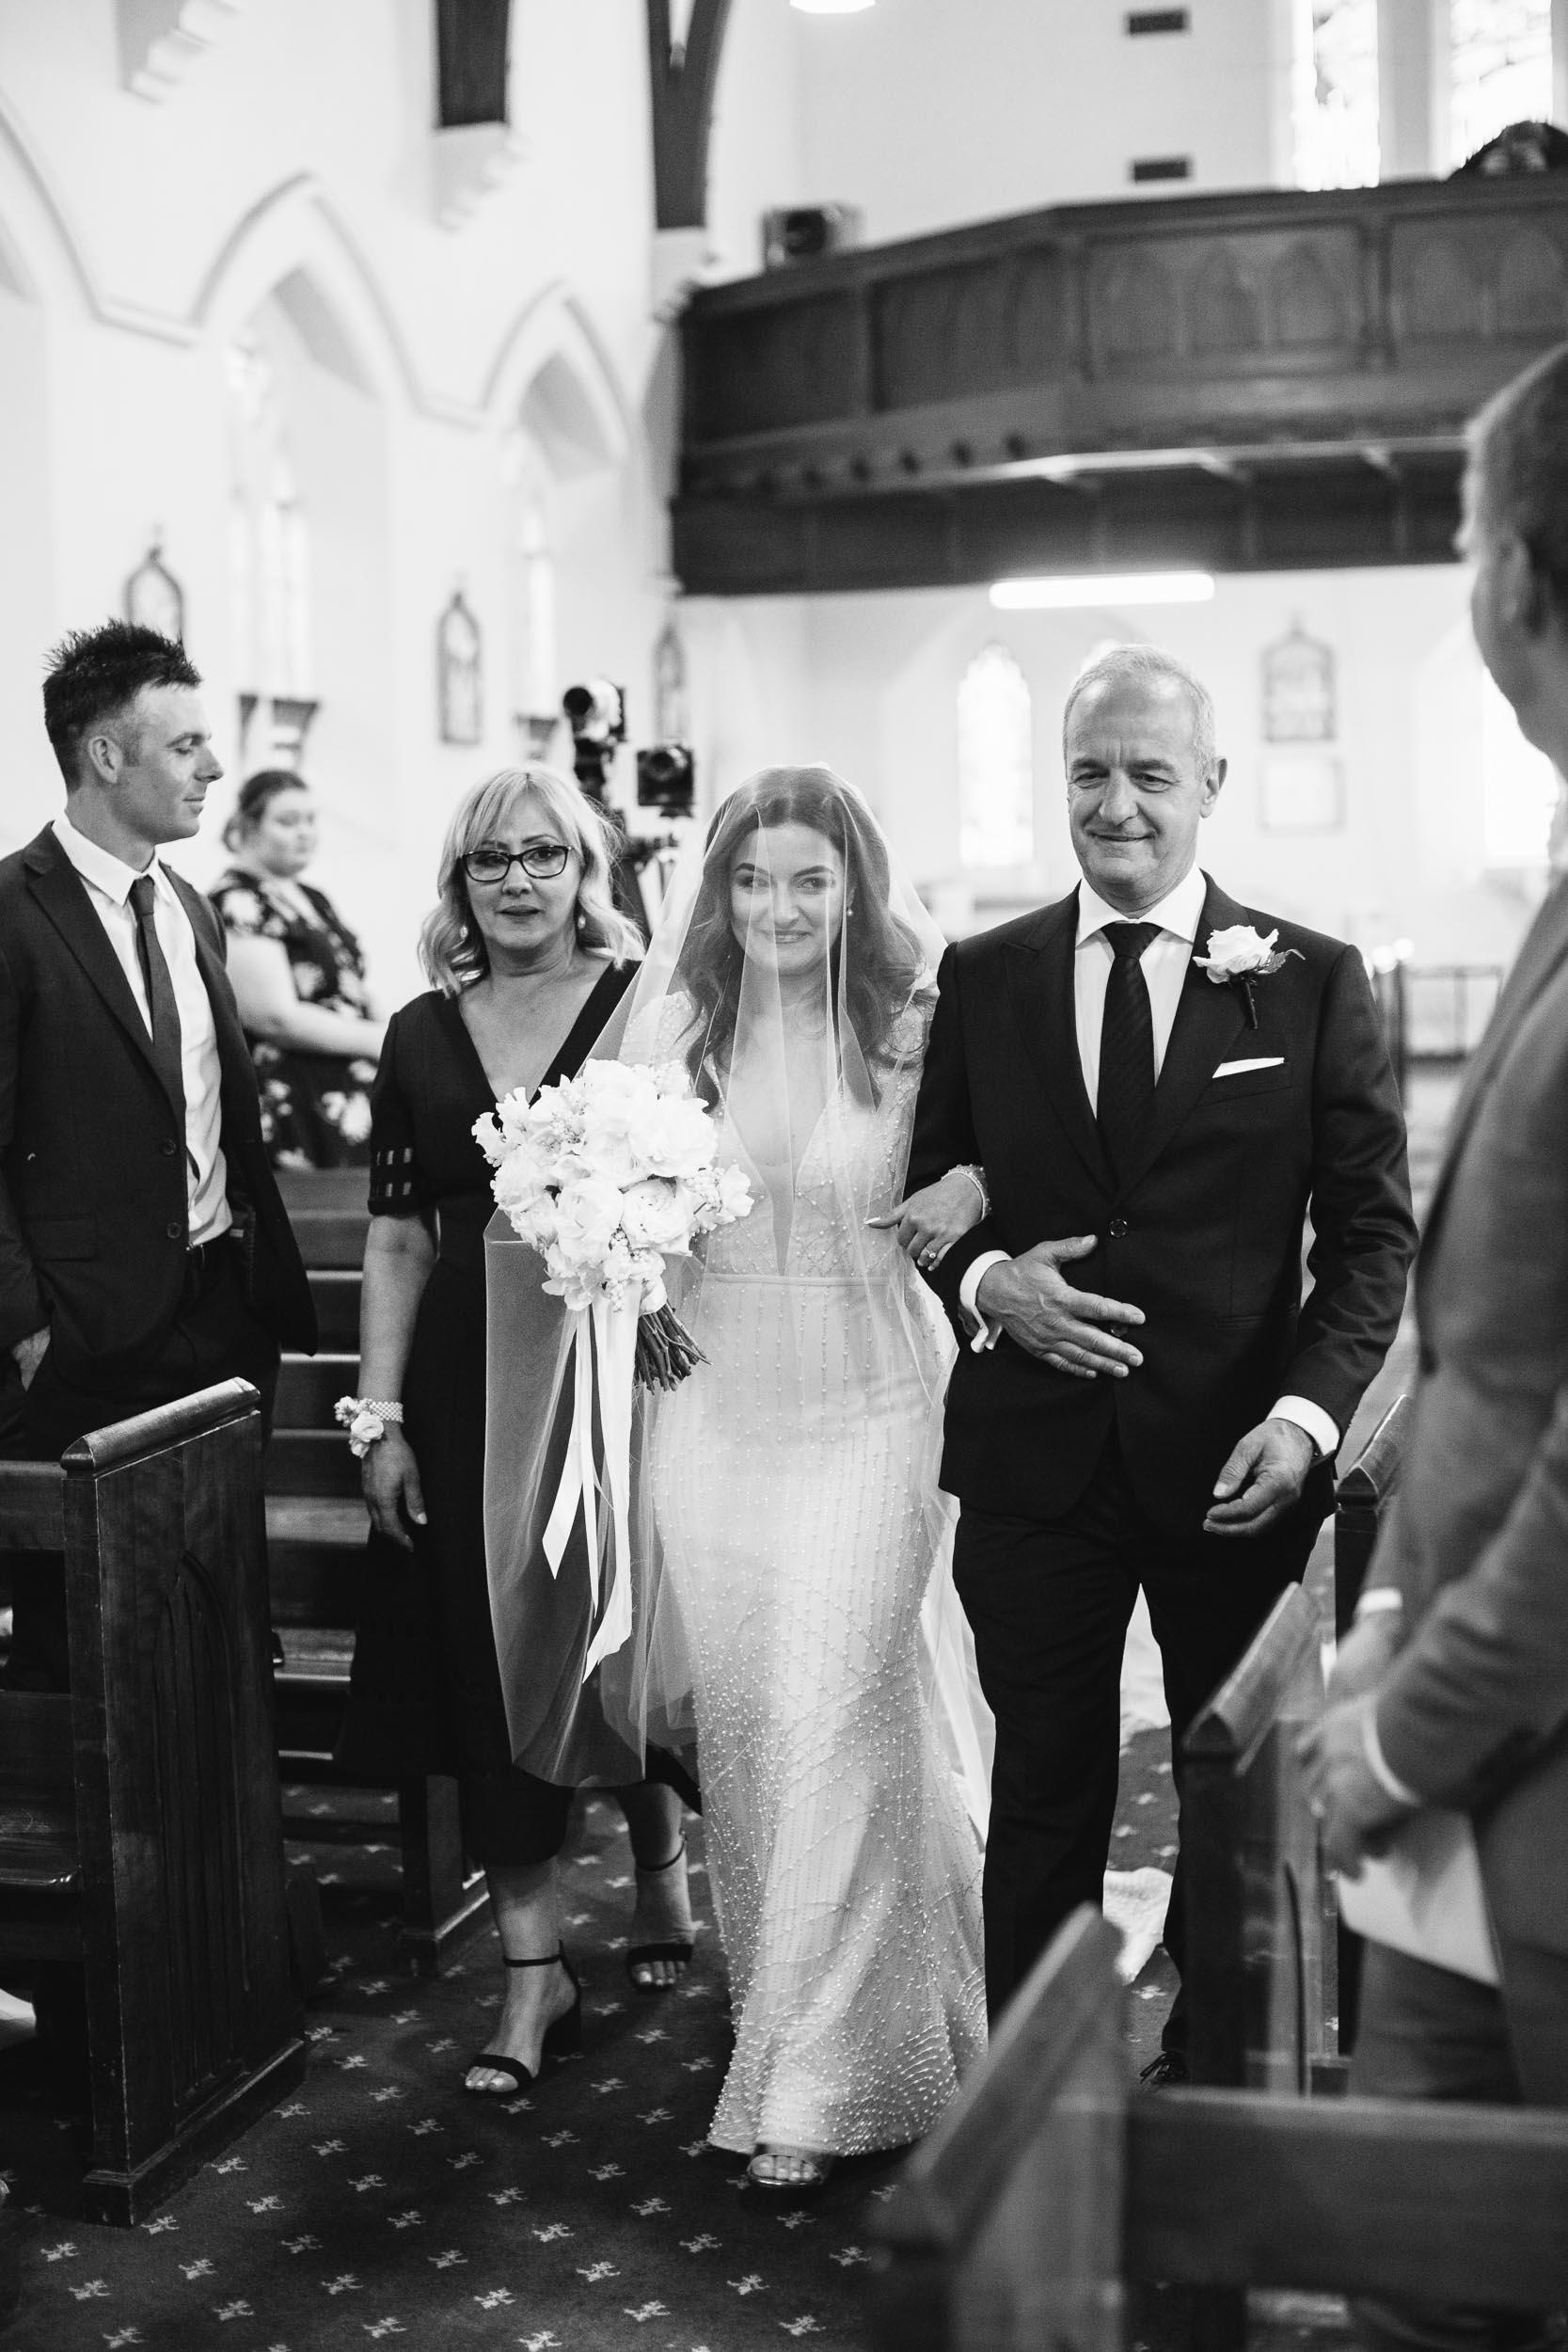 Kas-Richards-Wedding-Photographer-Melbourne-City-Wedding-Alto-Event-Space-Jane-Hill-Bridal-Gown-26.jpg